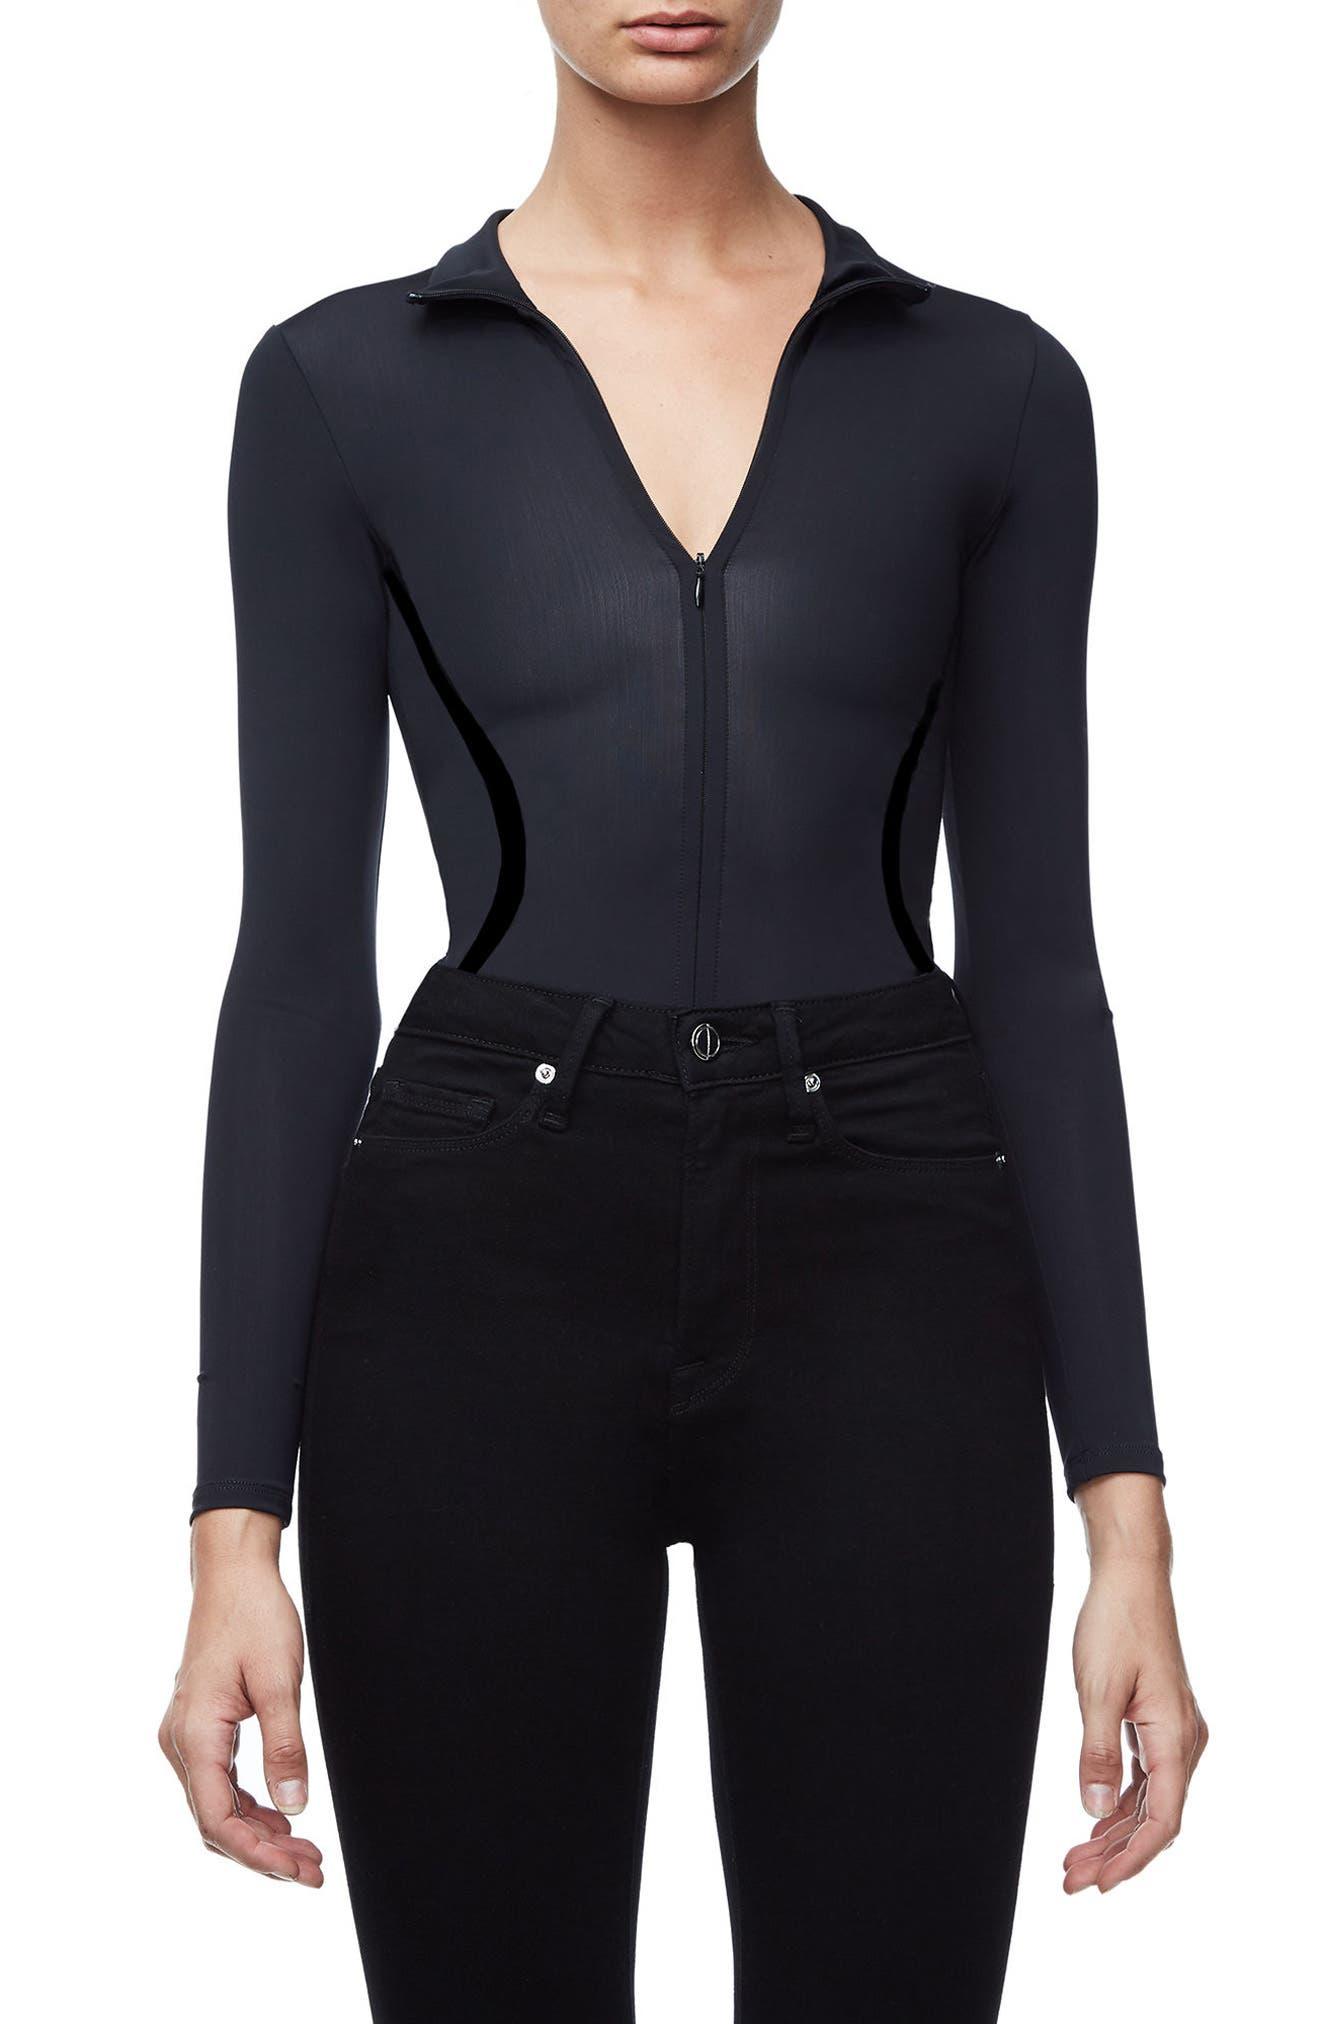 The Slightly Scuba Thong Bodysuit,                         Main,                         color, Black001